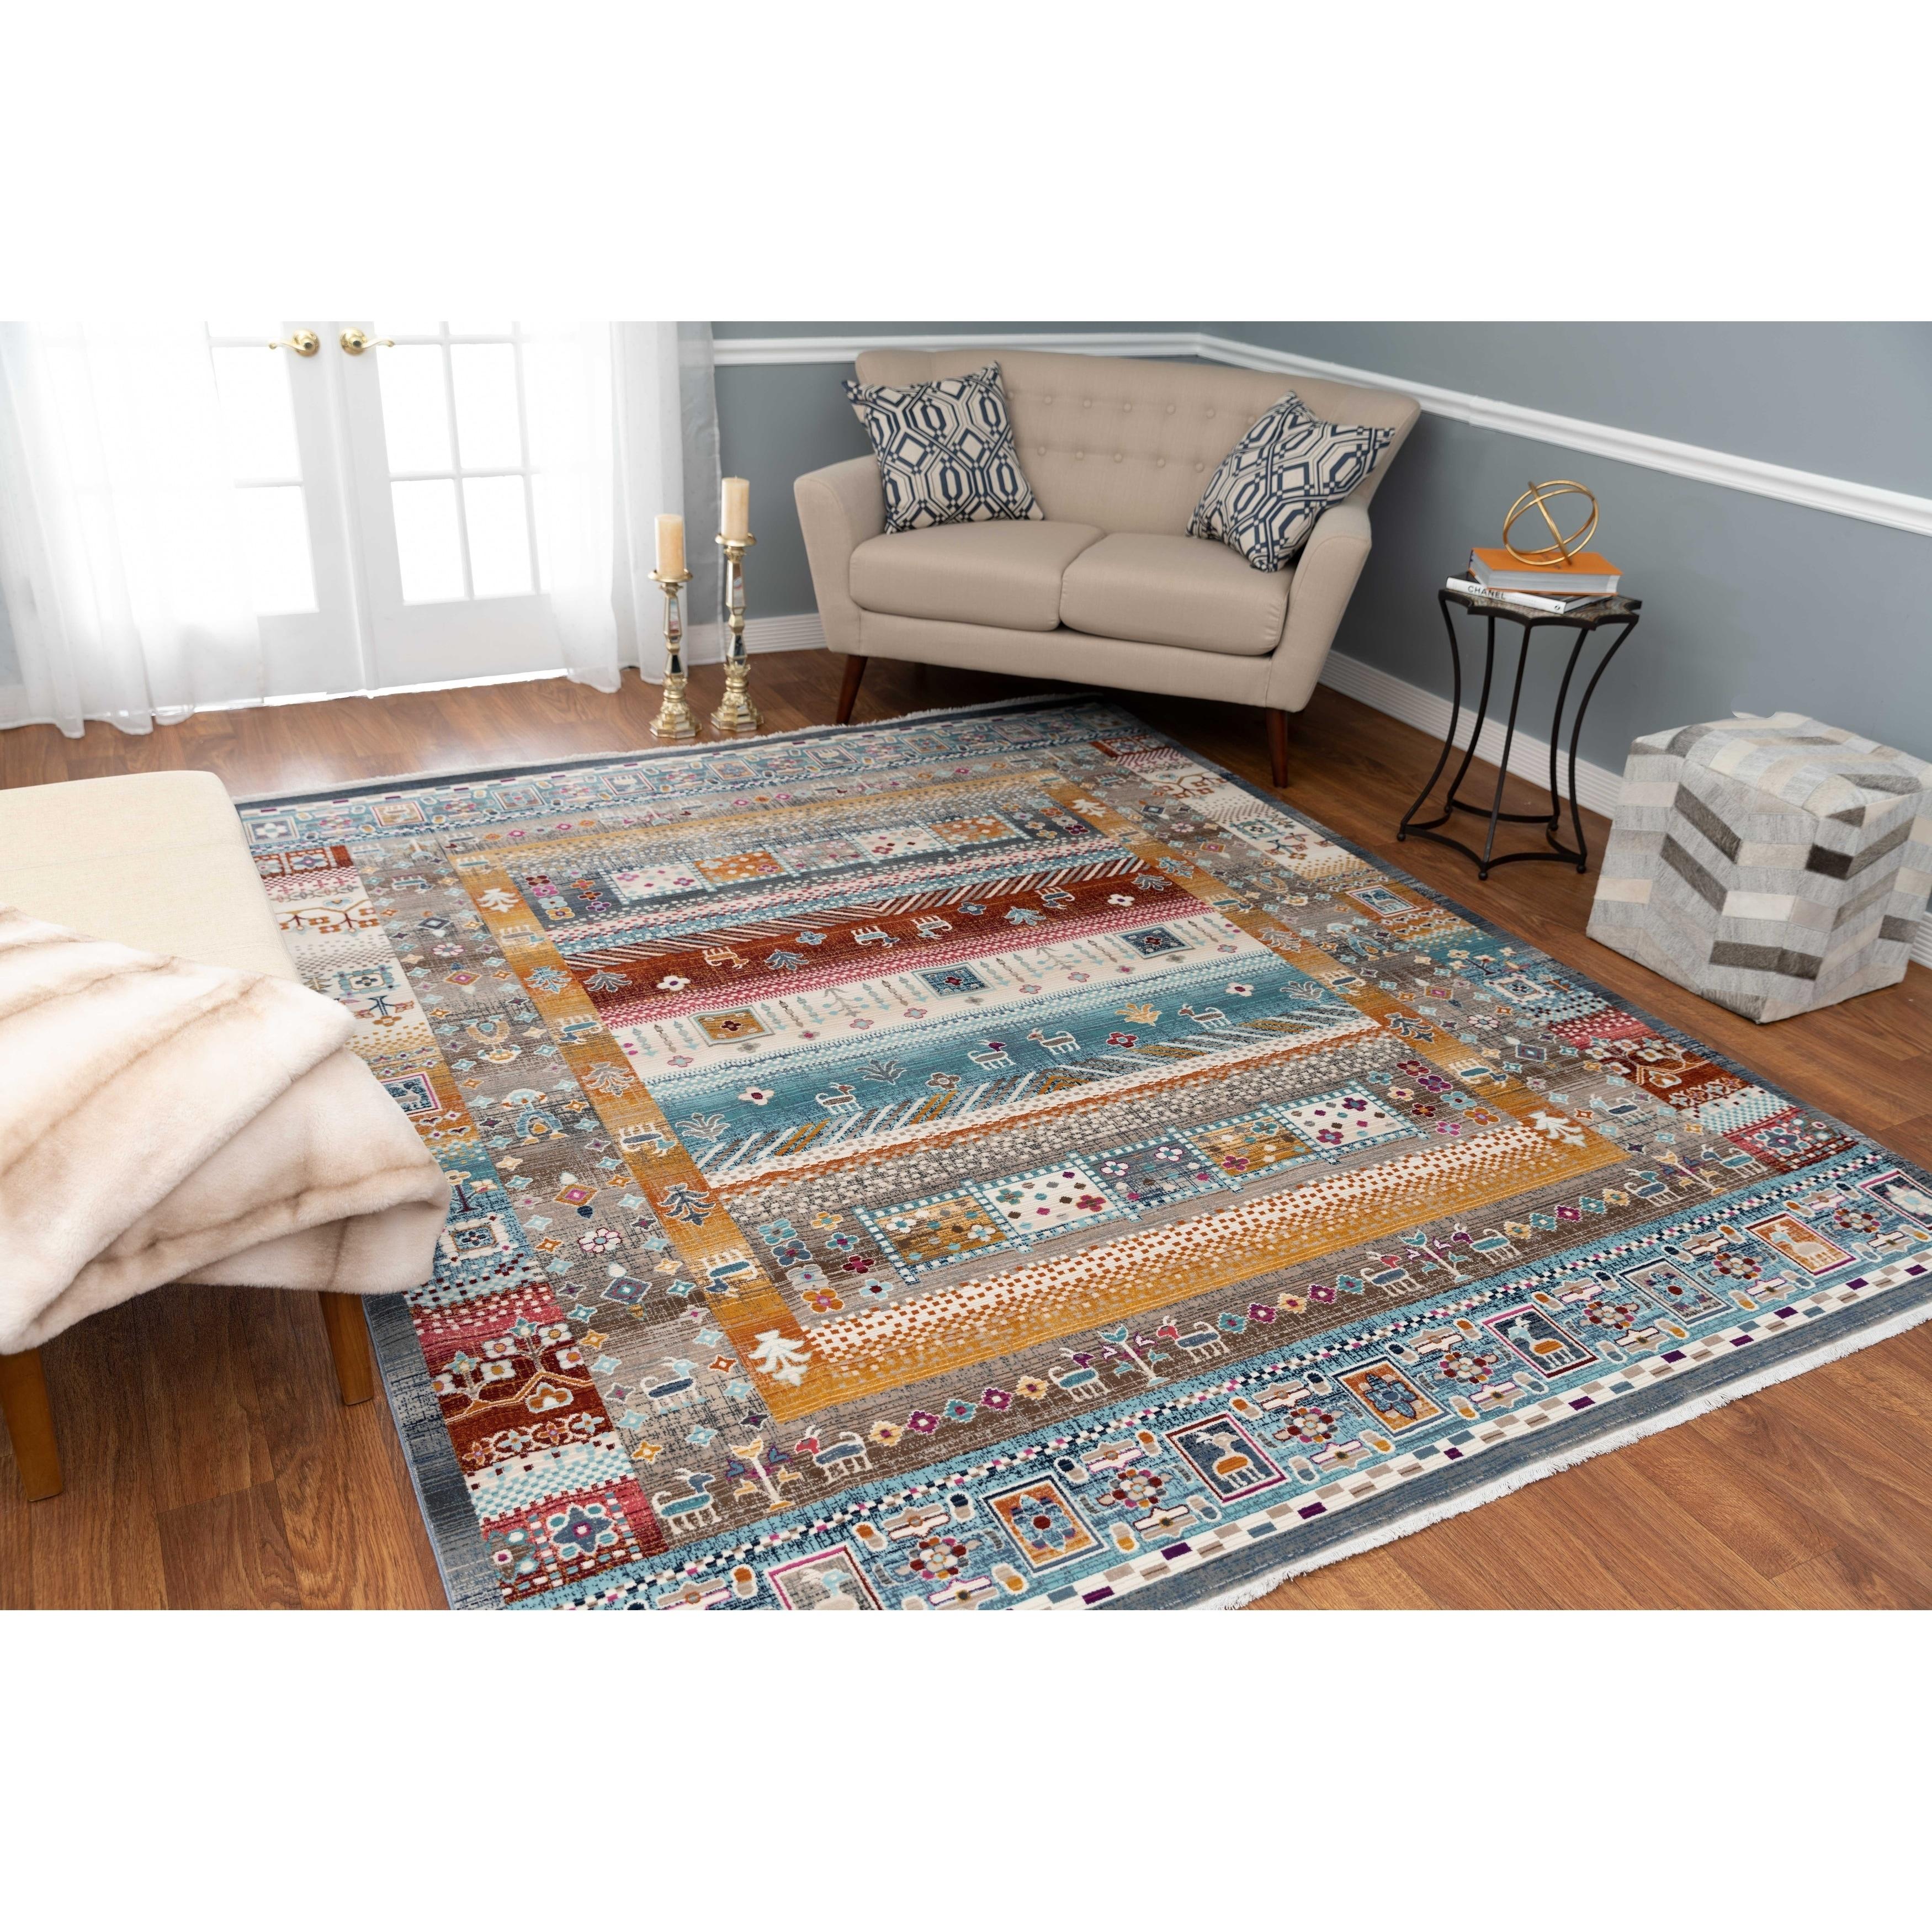 Cheap Hardwood Flooring Murphy Nc: Carpet Vidalondon